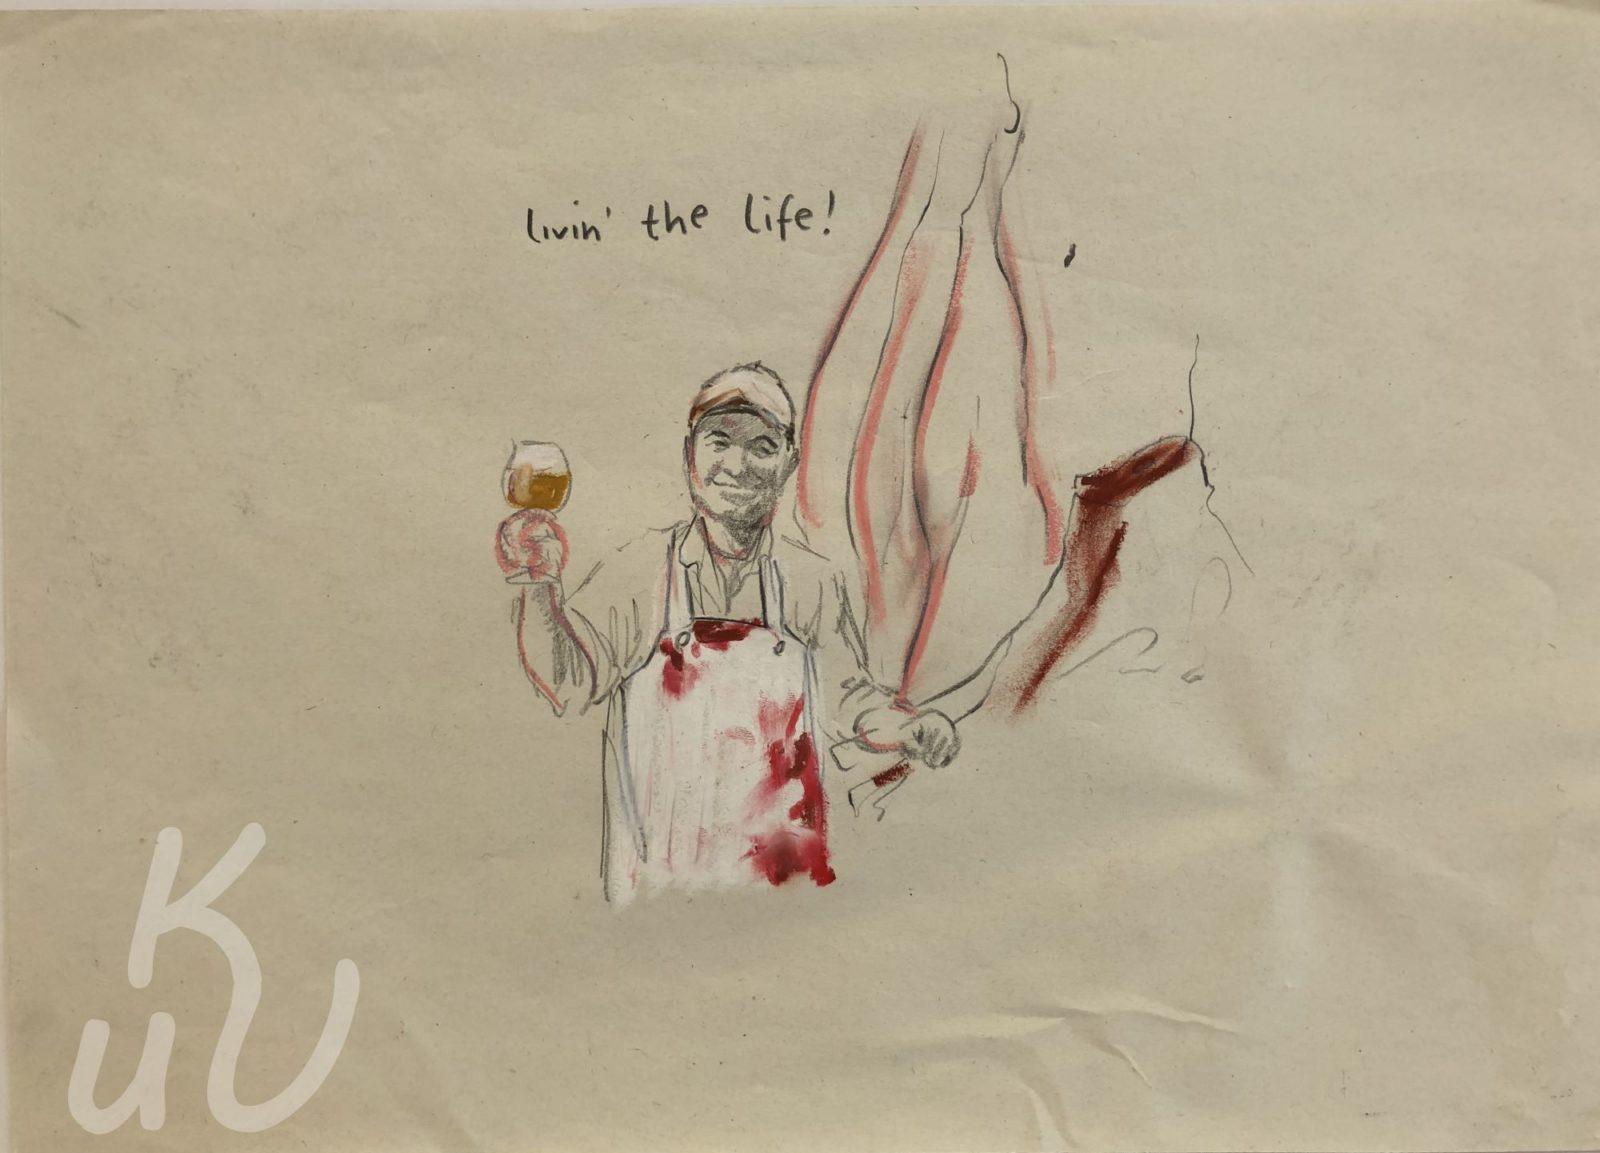 Livin the life von Jonas Mosbacher